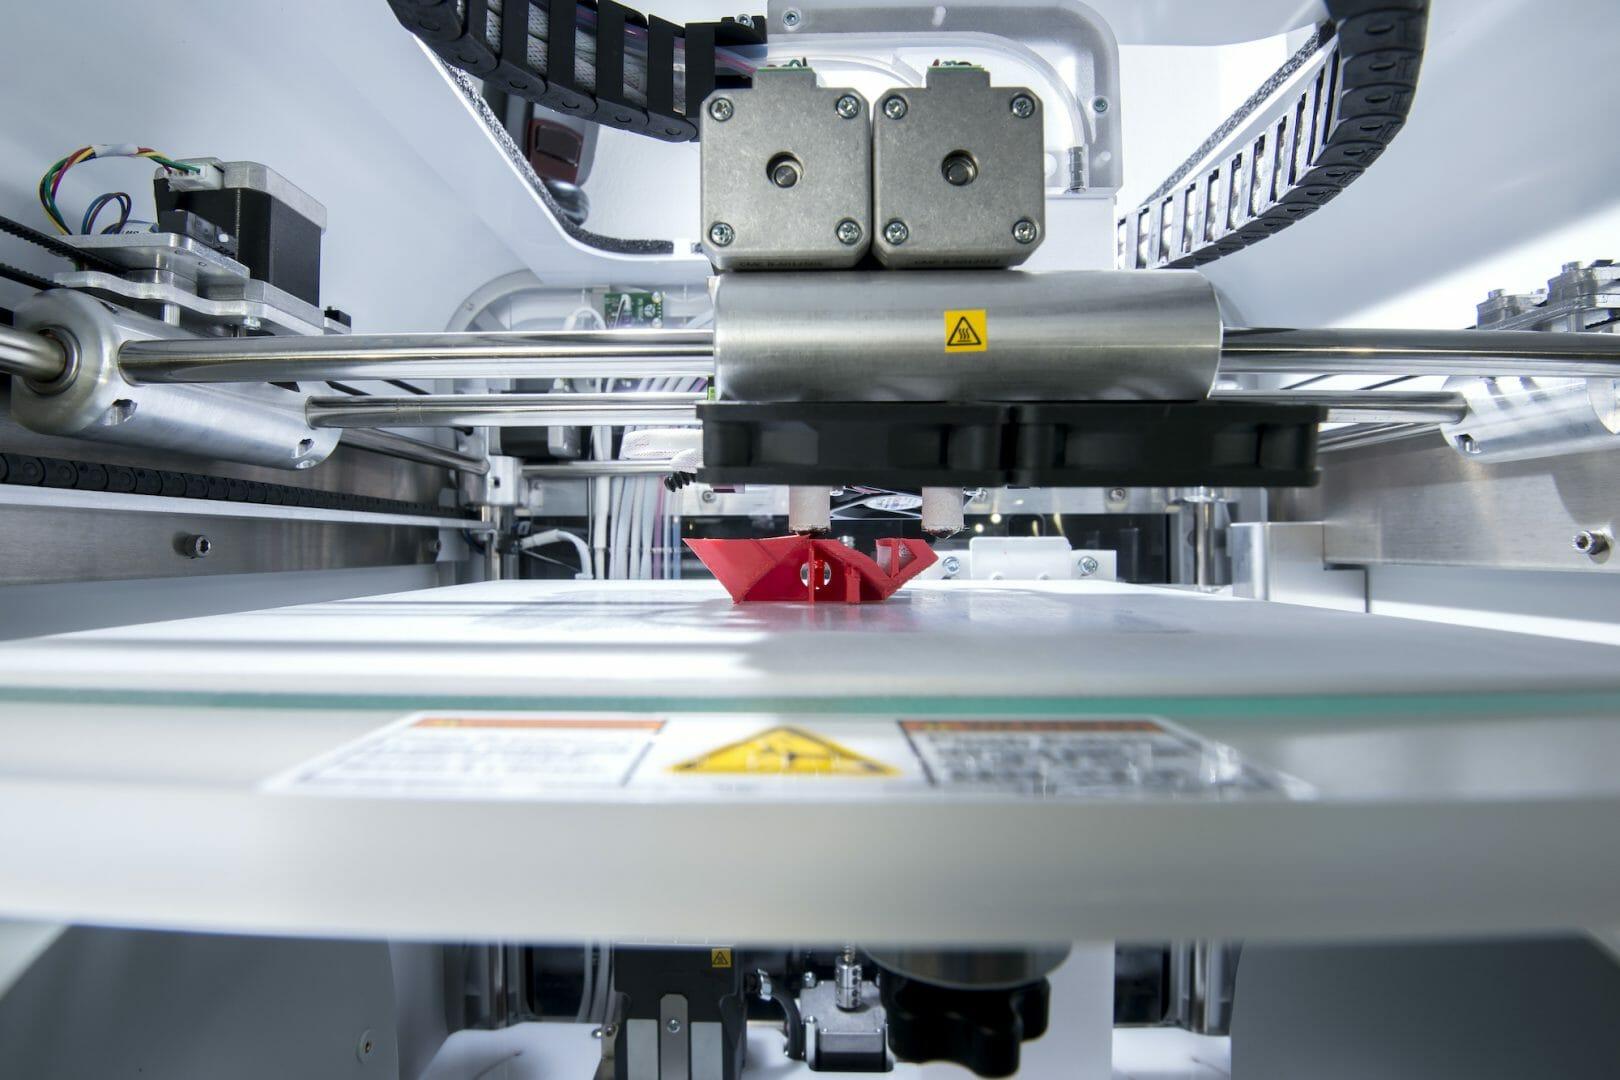 Comparing Laser Cutting Vs 3D Printing